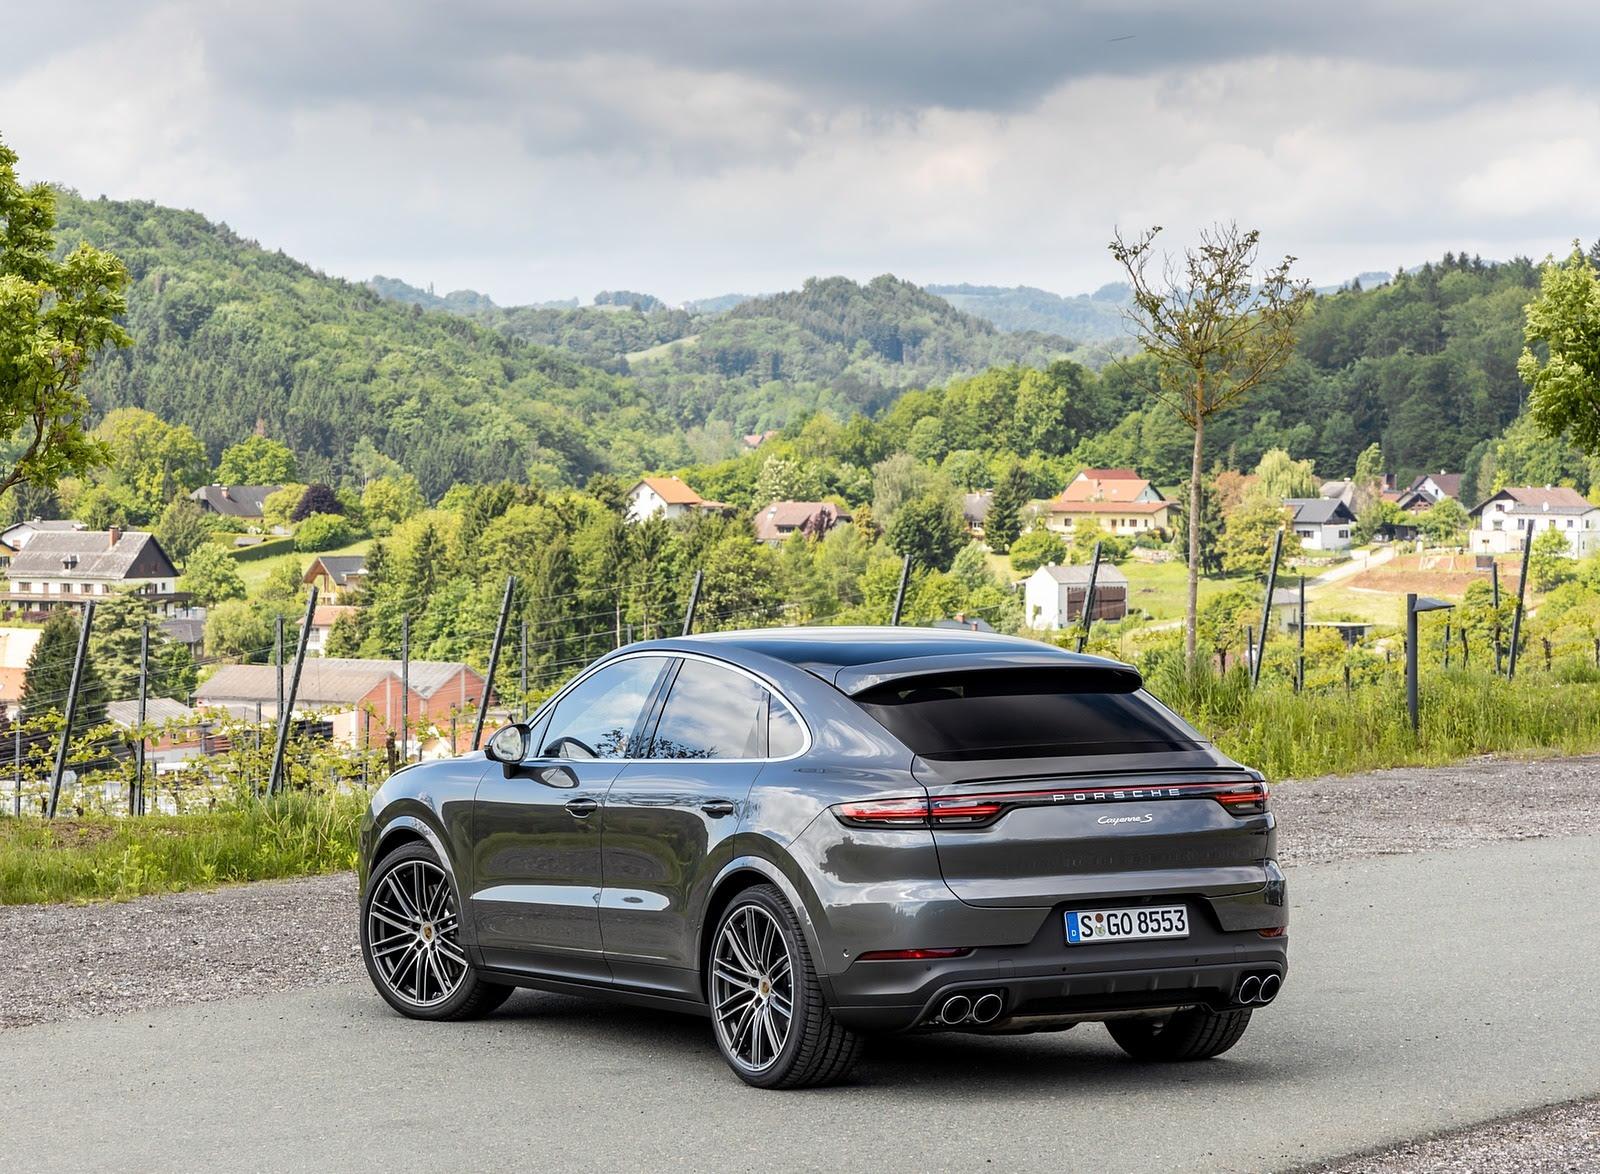 2020 Porsche Cayenne S Coupe Color Quarzite Grey Metallic Rear Images, Photos, Reviews